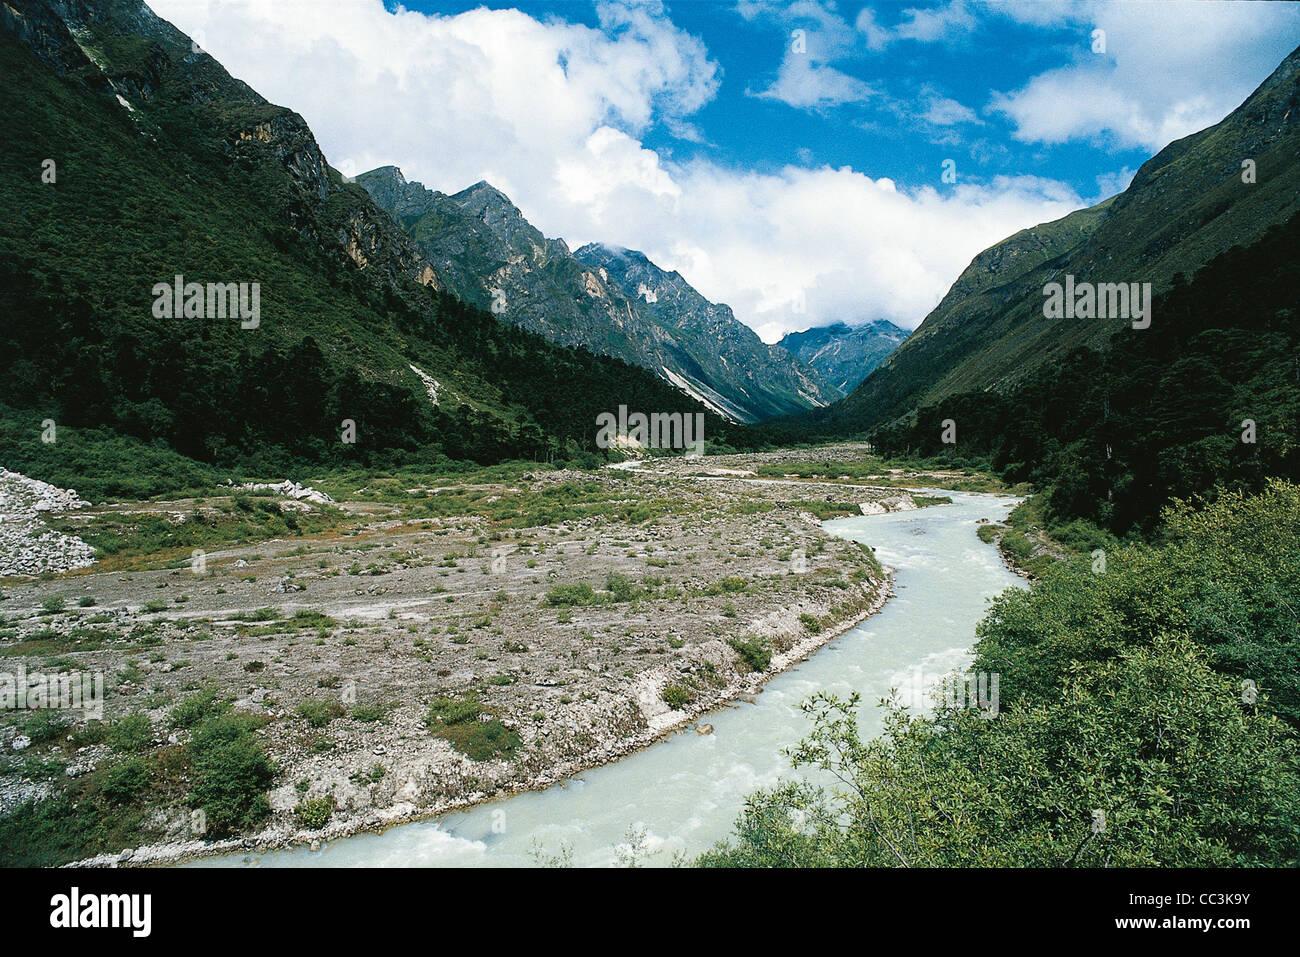 Bhutan - Himalaya. Lunana. Pho Chhu River Valley Stock Photo